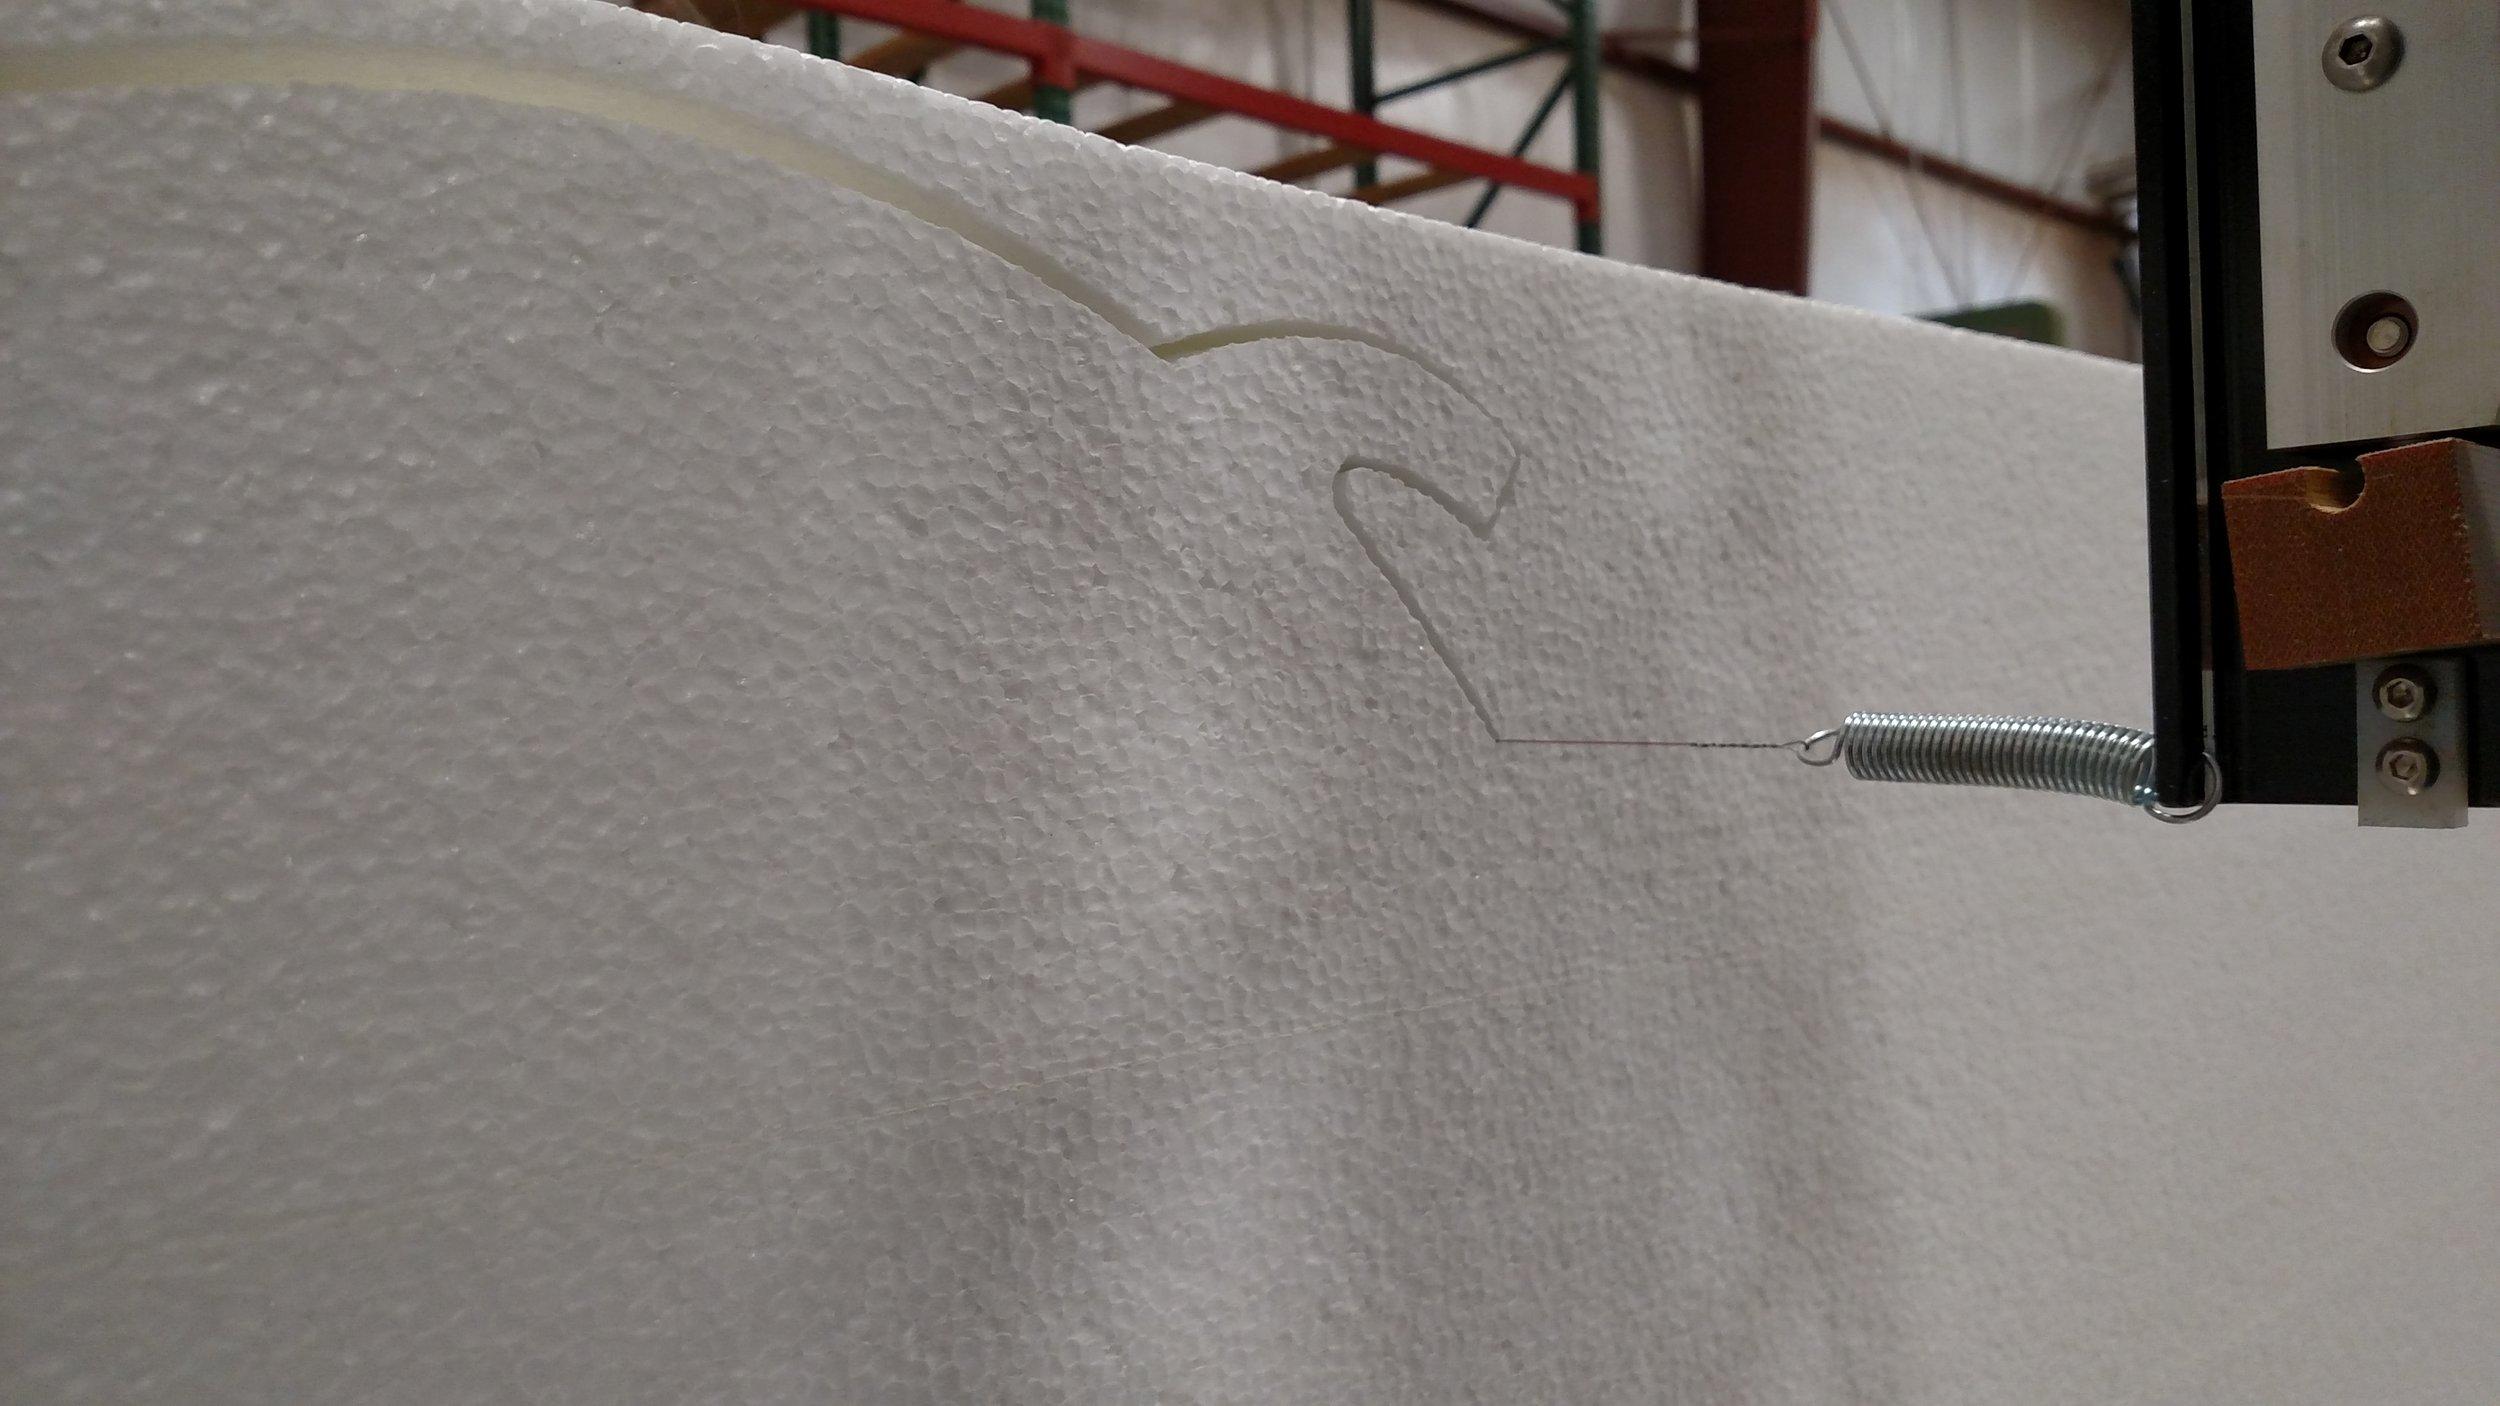 foam cutting 02.jpg